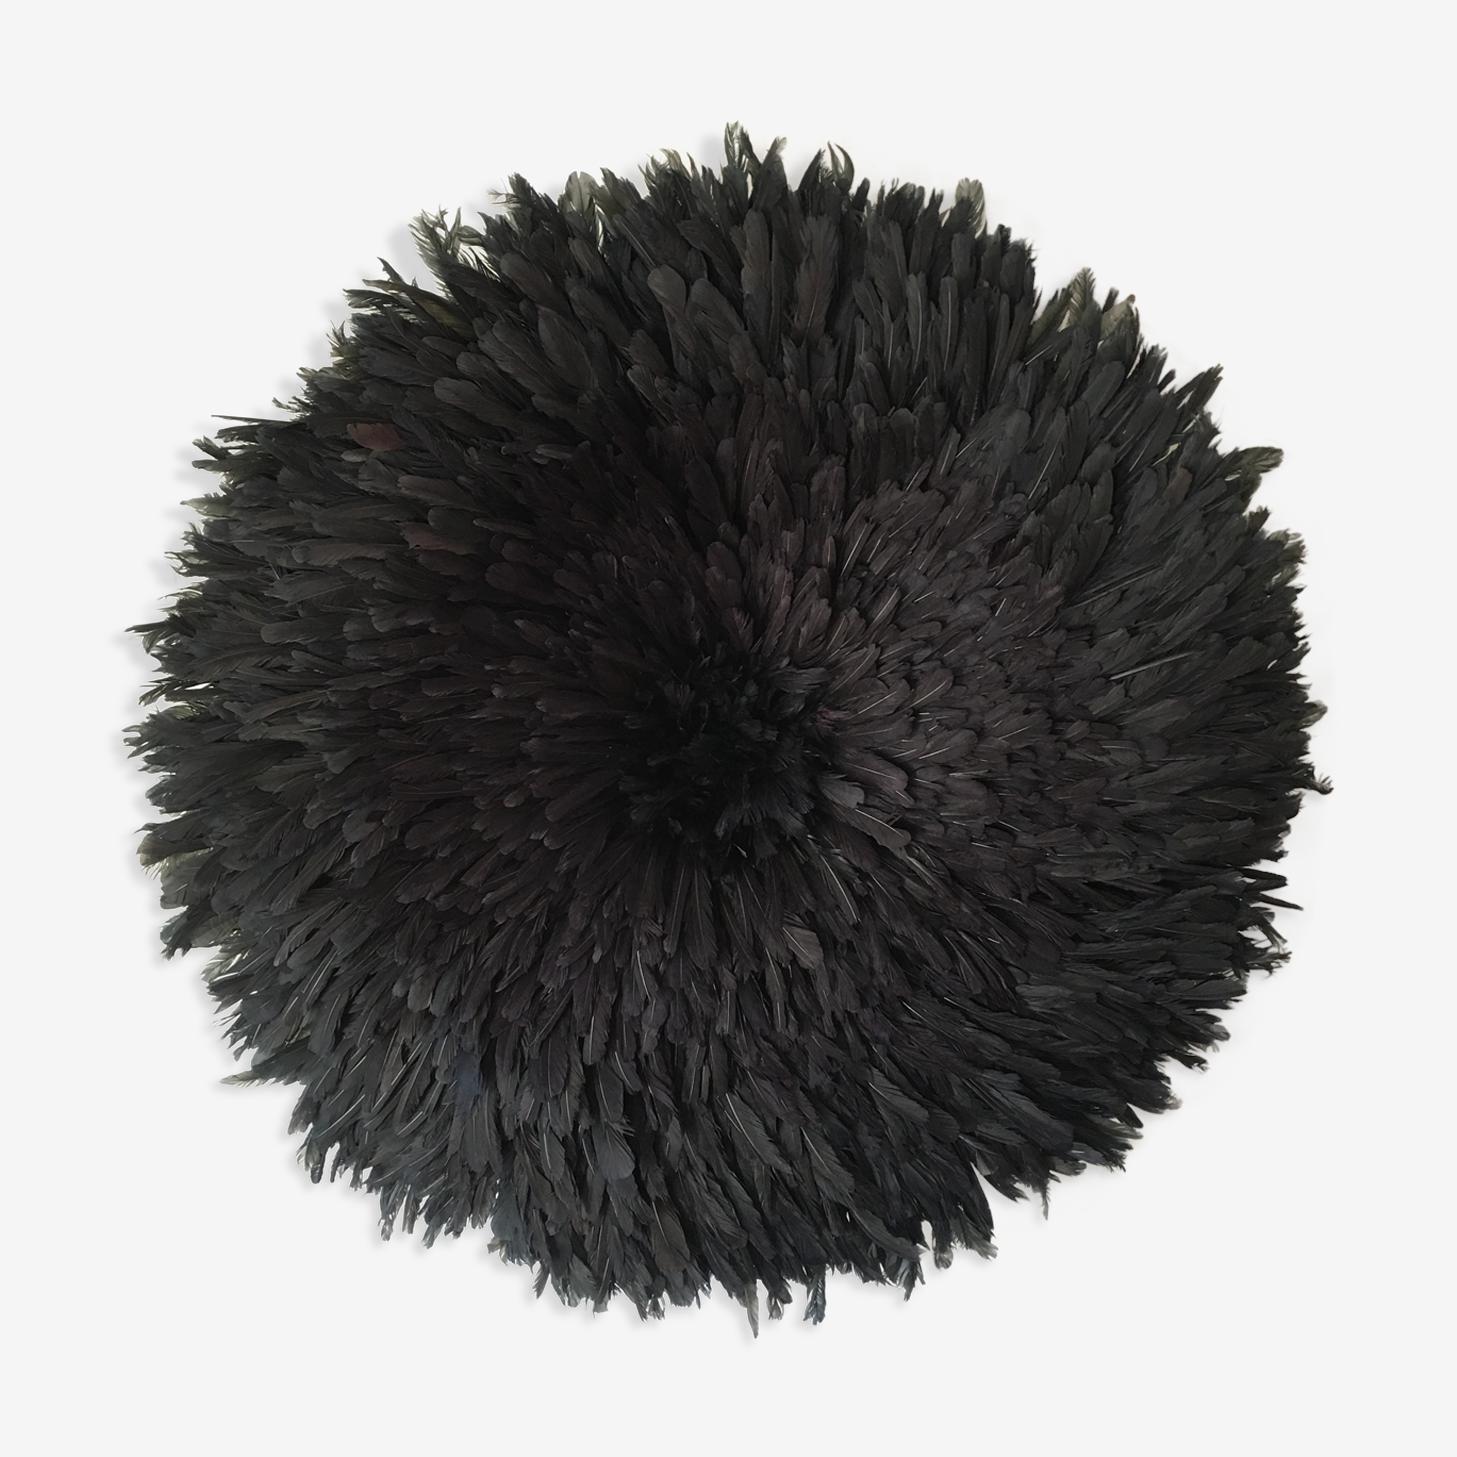 Juju hat noir, 80 cm